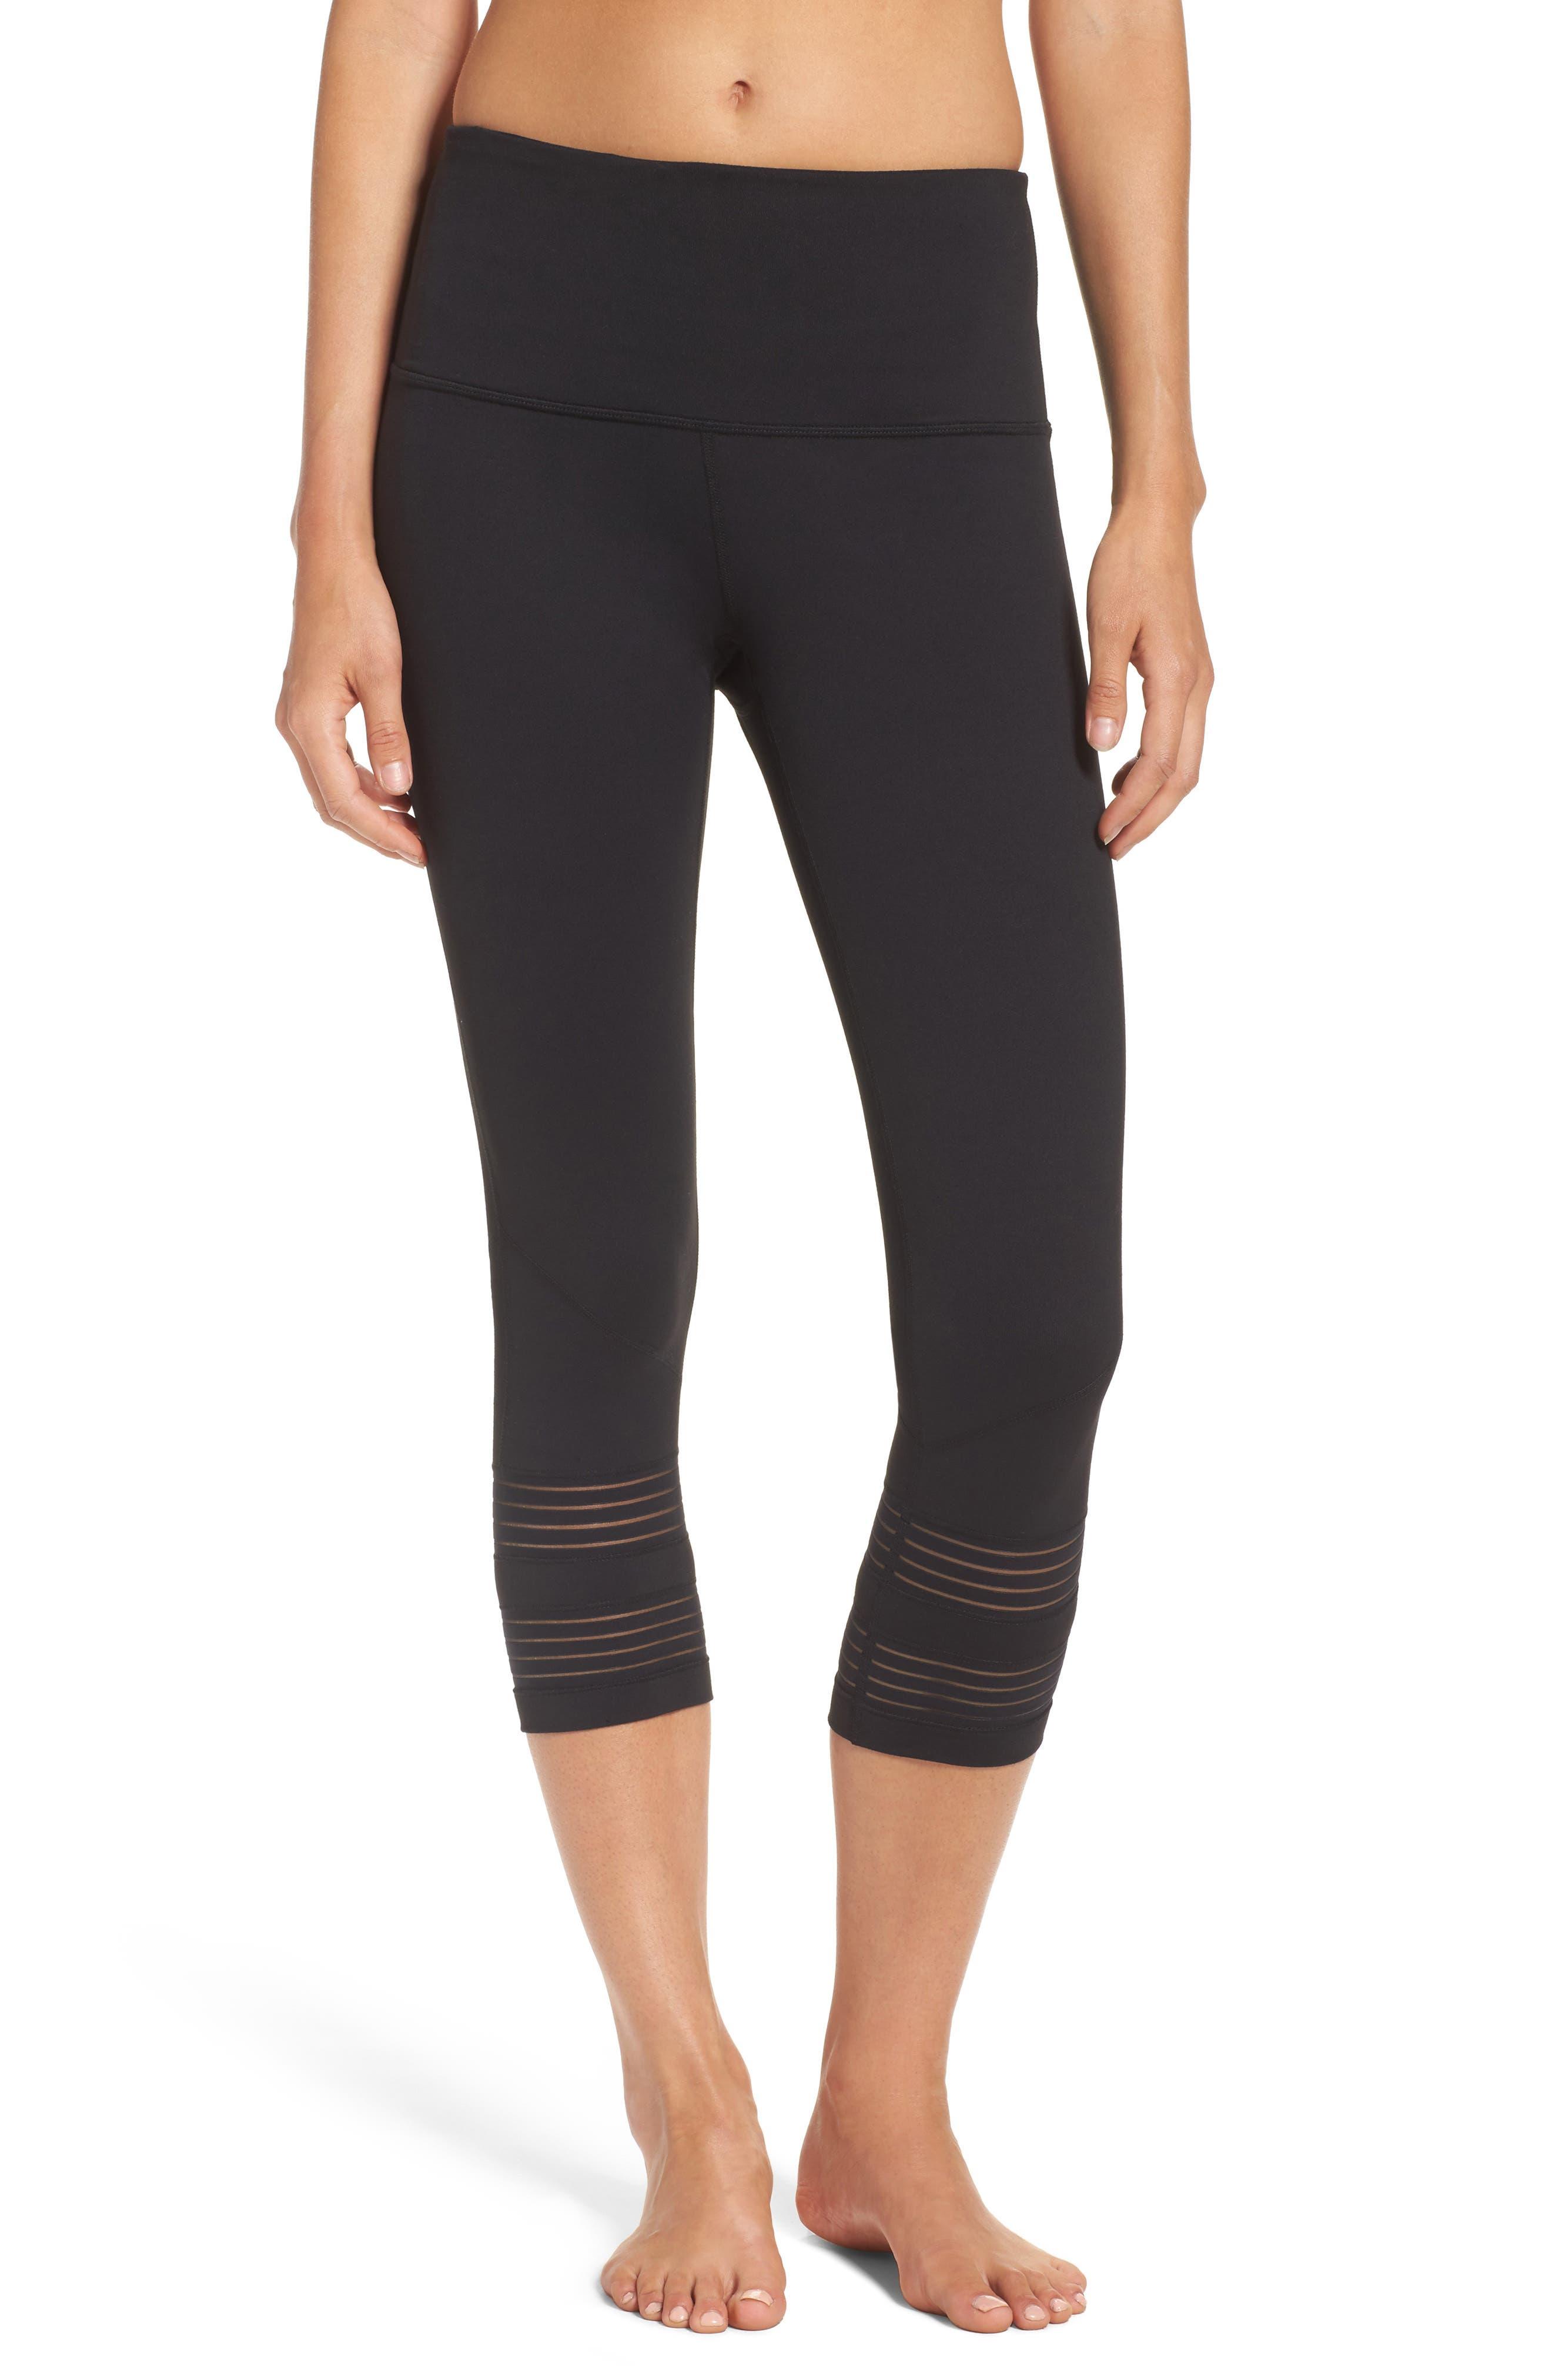 Twin High Waist Crop Leggings,                         Main,                         color, Black